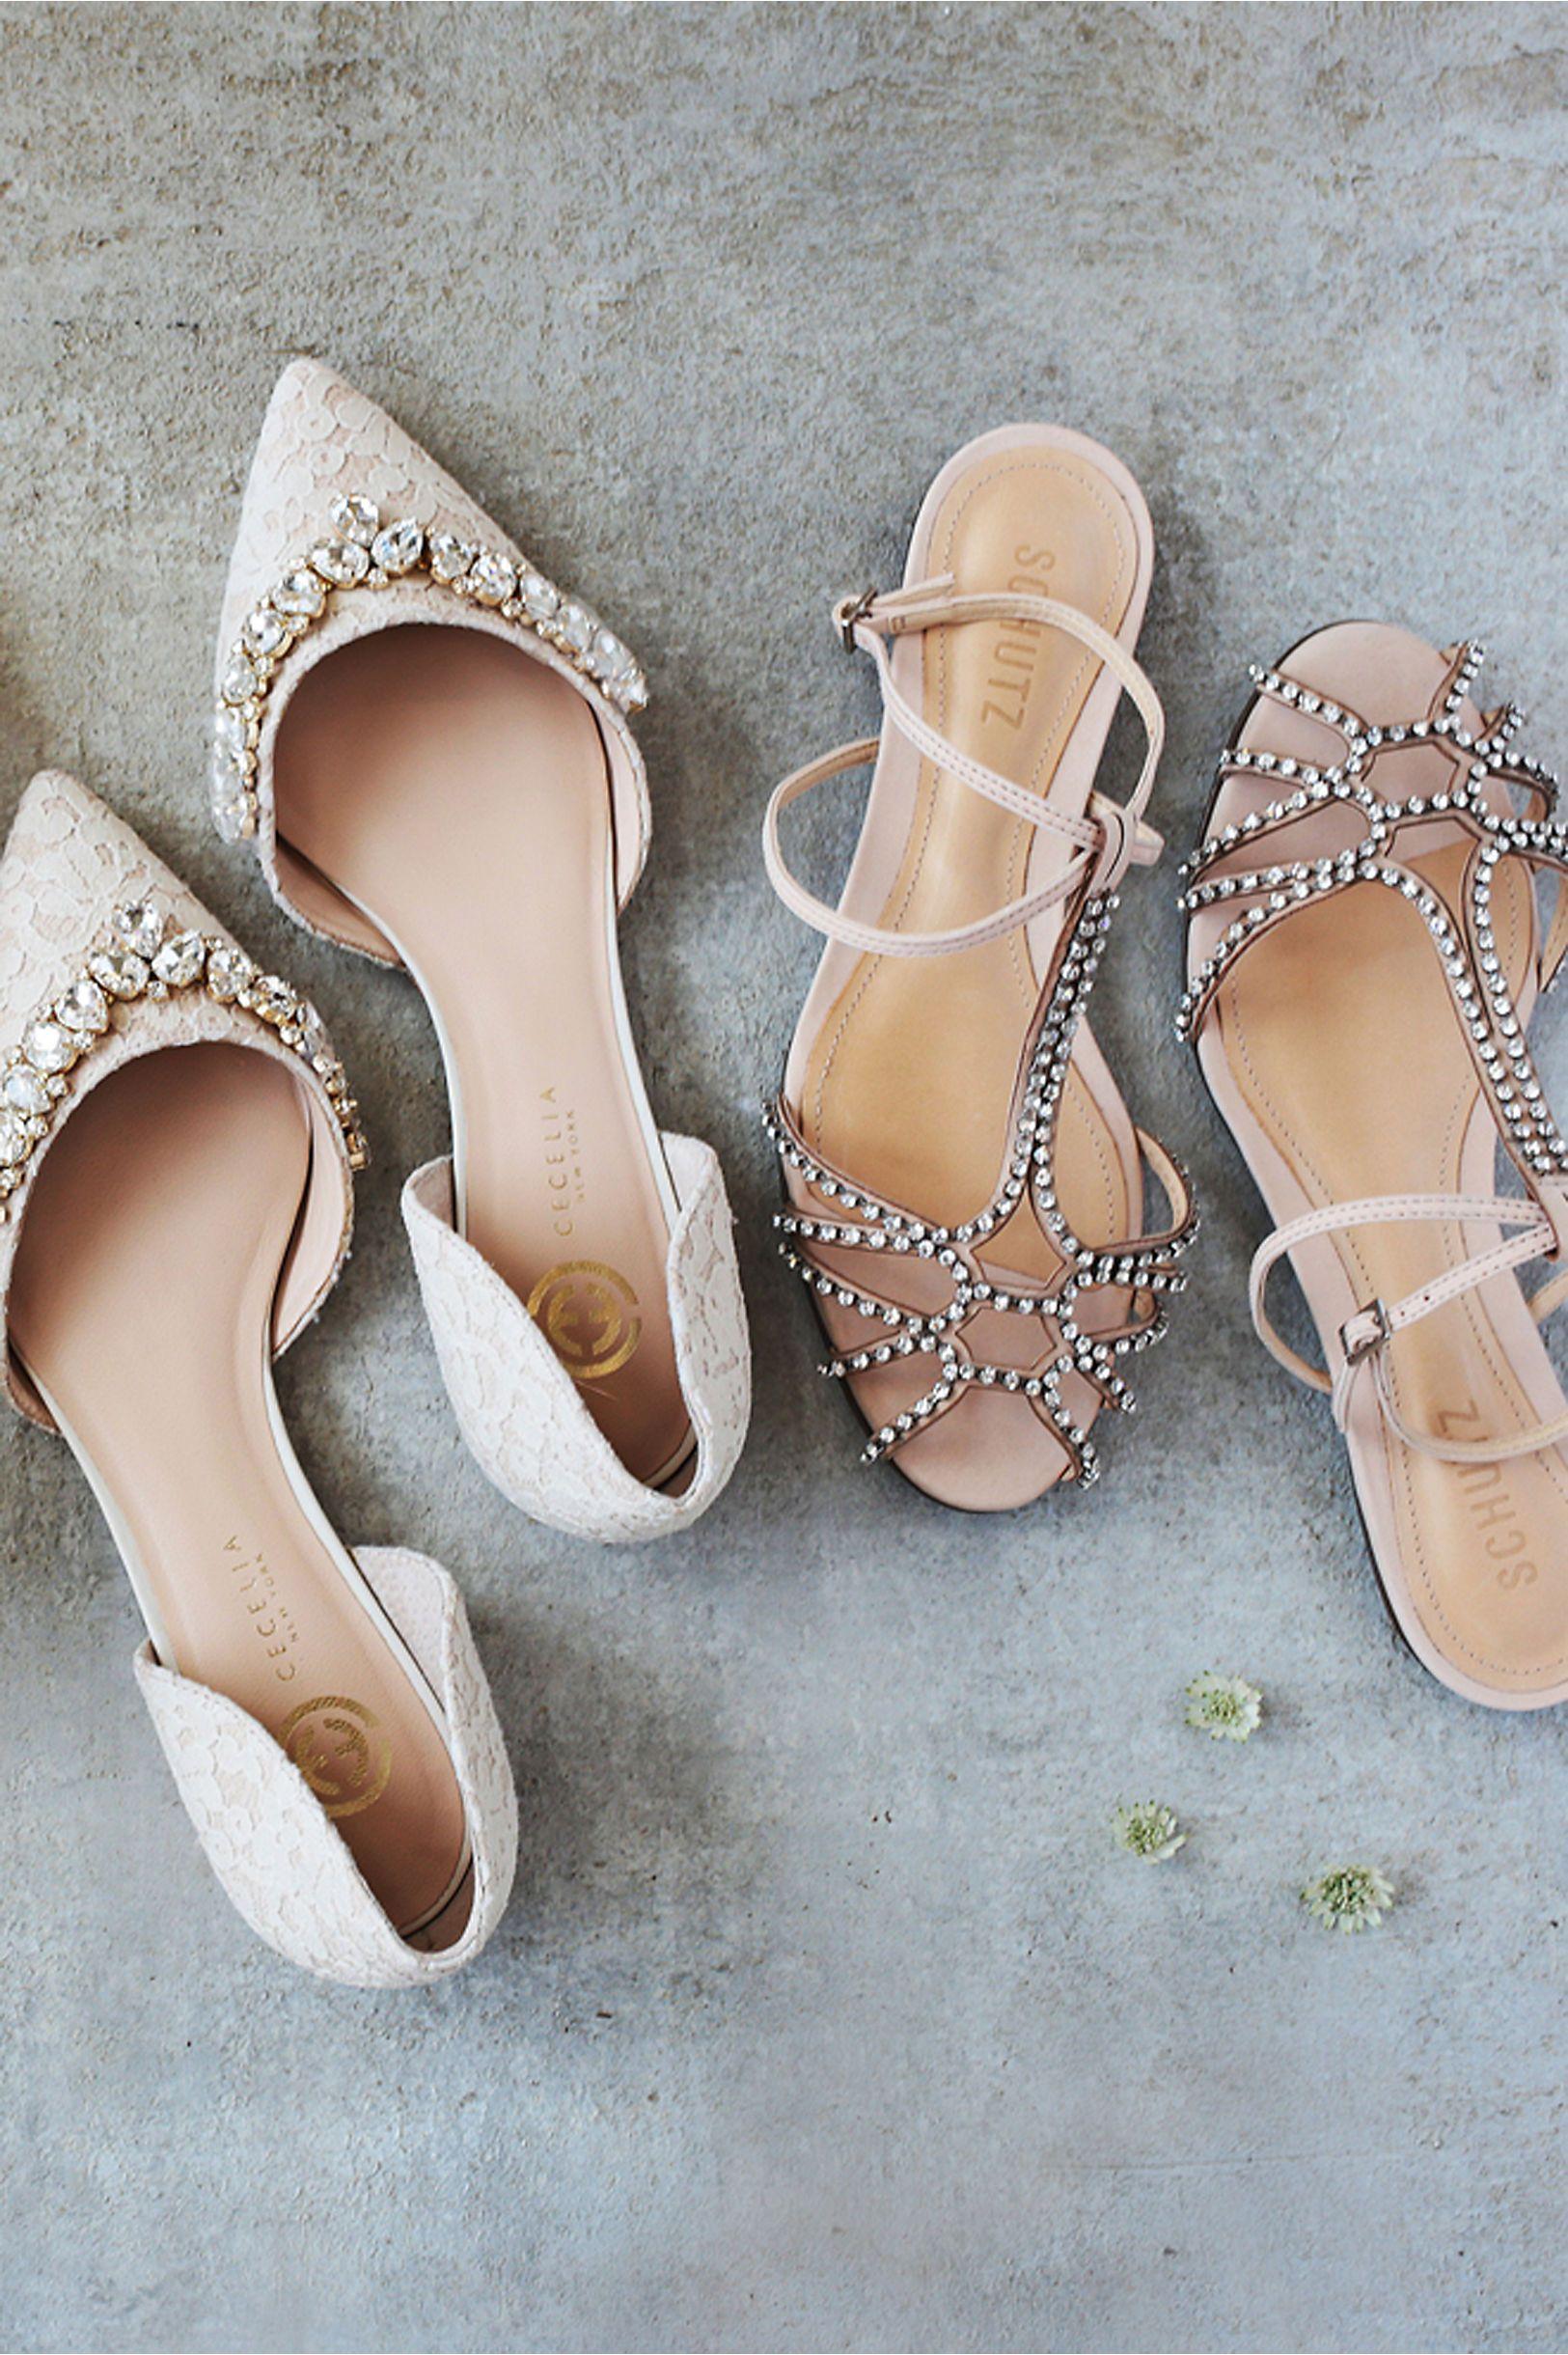 aecc5e56f2e6 Lotti Lace Flats + sparkling sandals from BHLDN | WEDDING SHOES ...